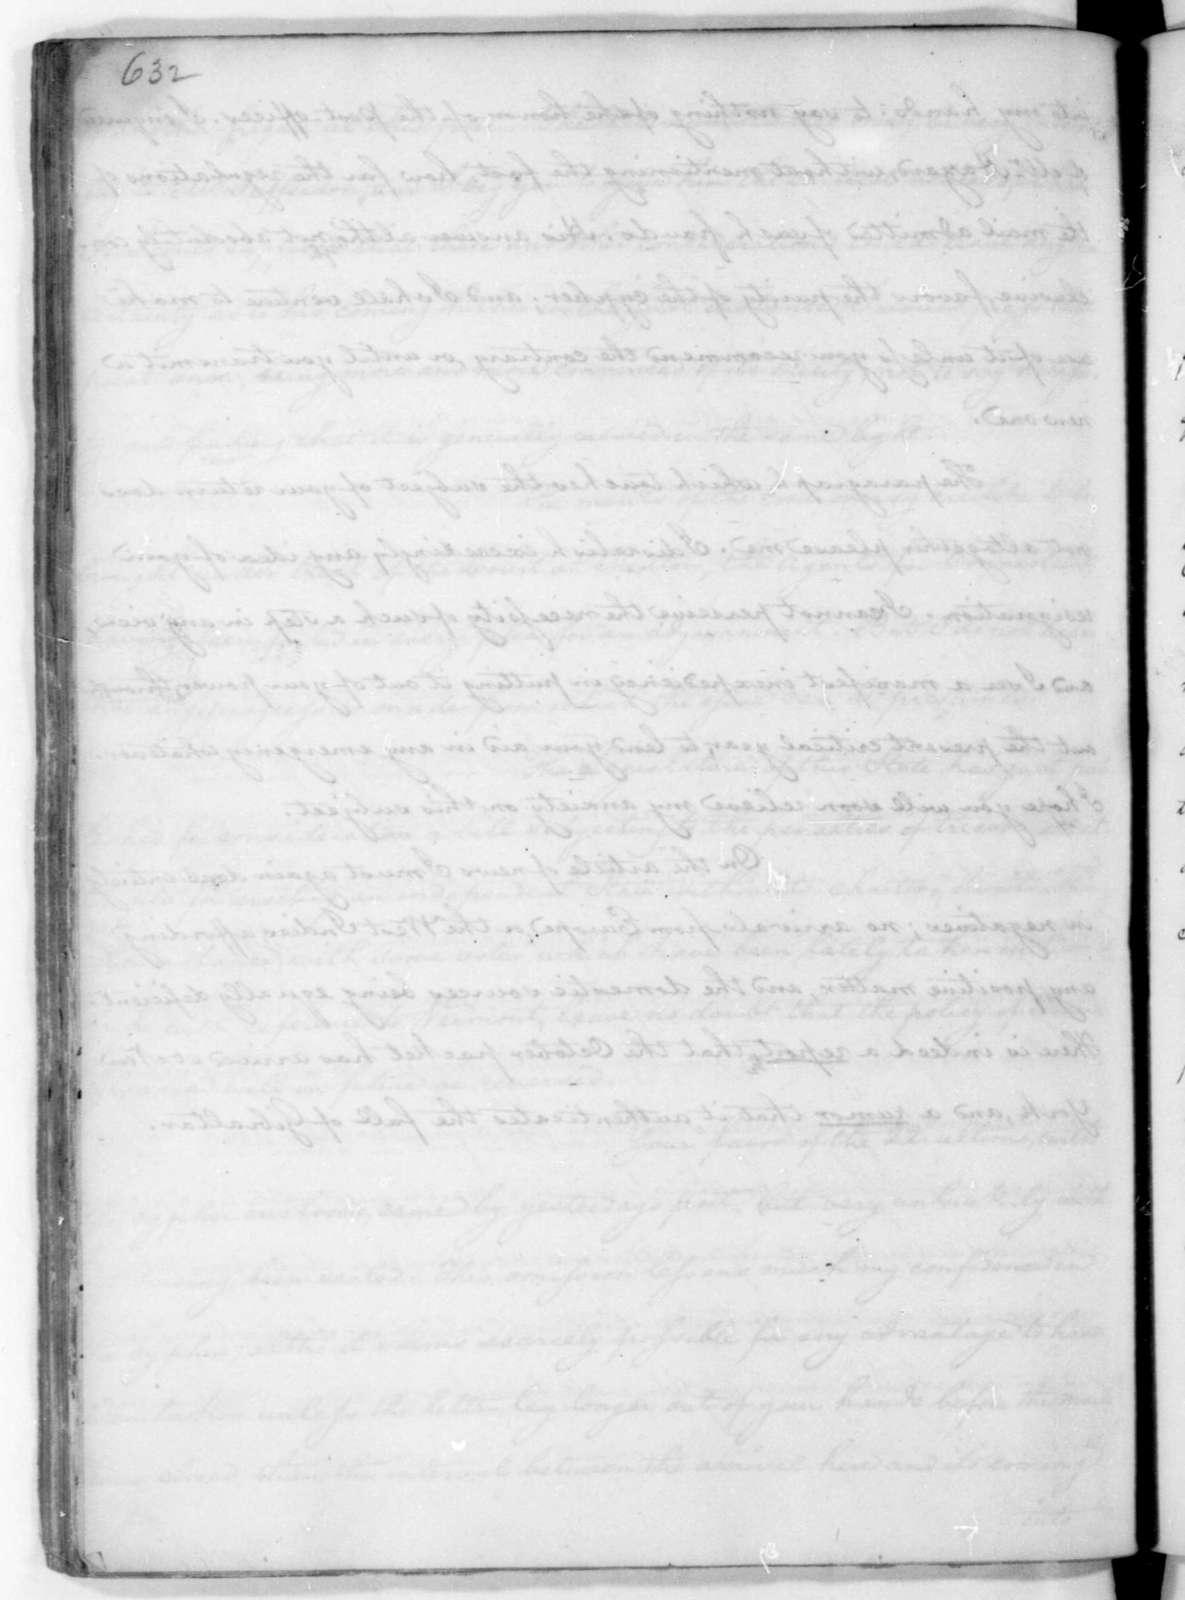 James Madison to Edmund Randolph, December 3, 1782.